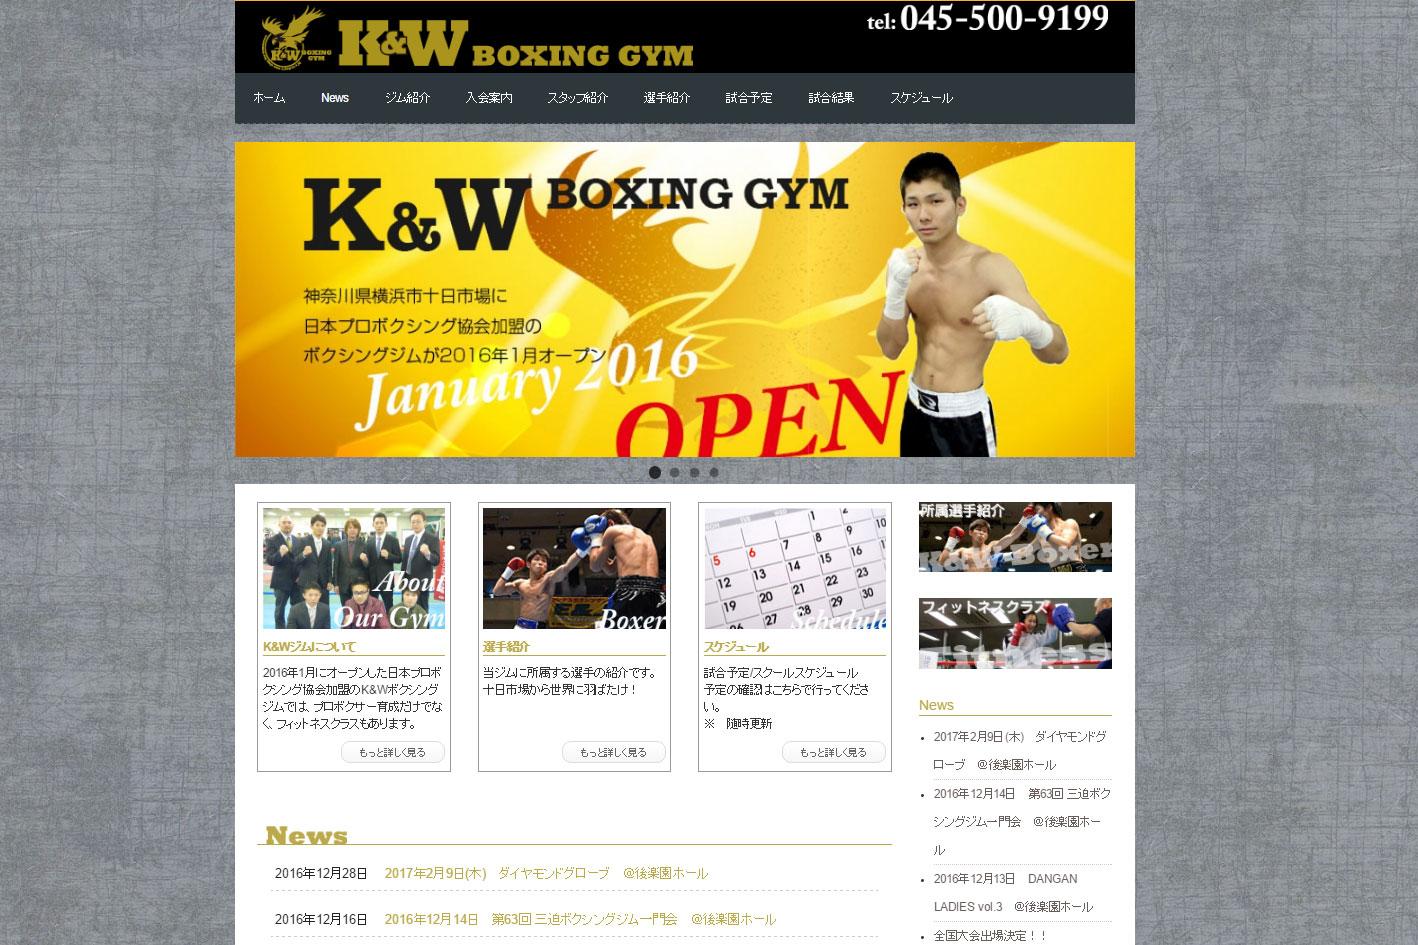 K&Wボクシングジム